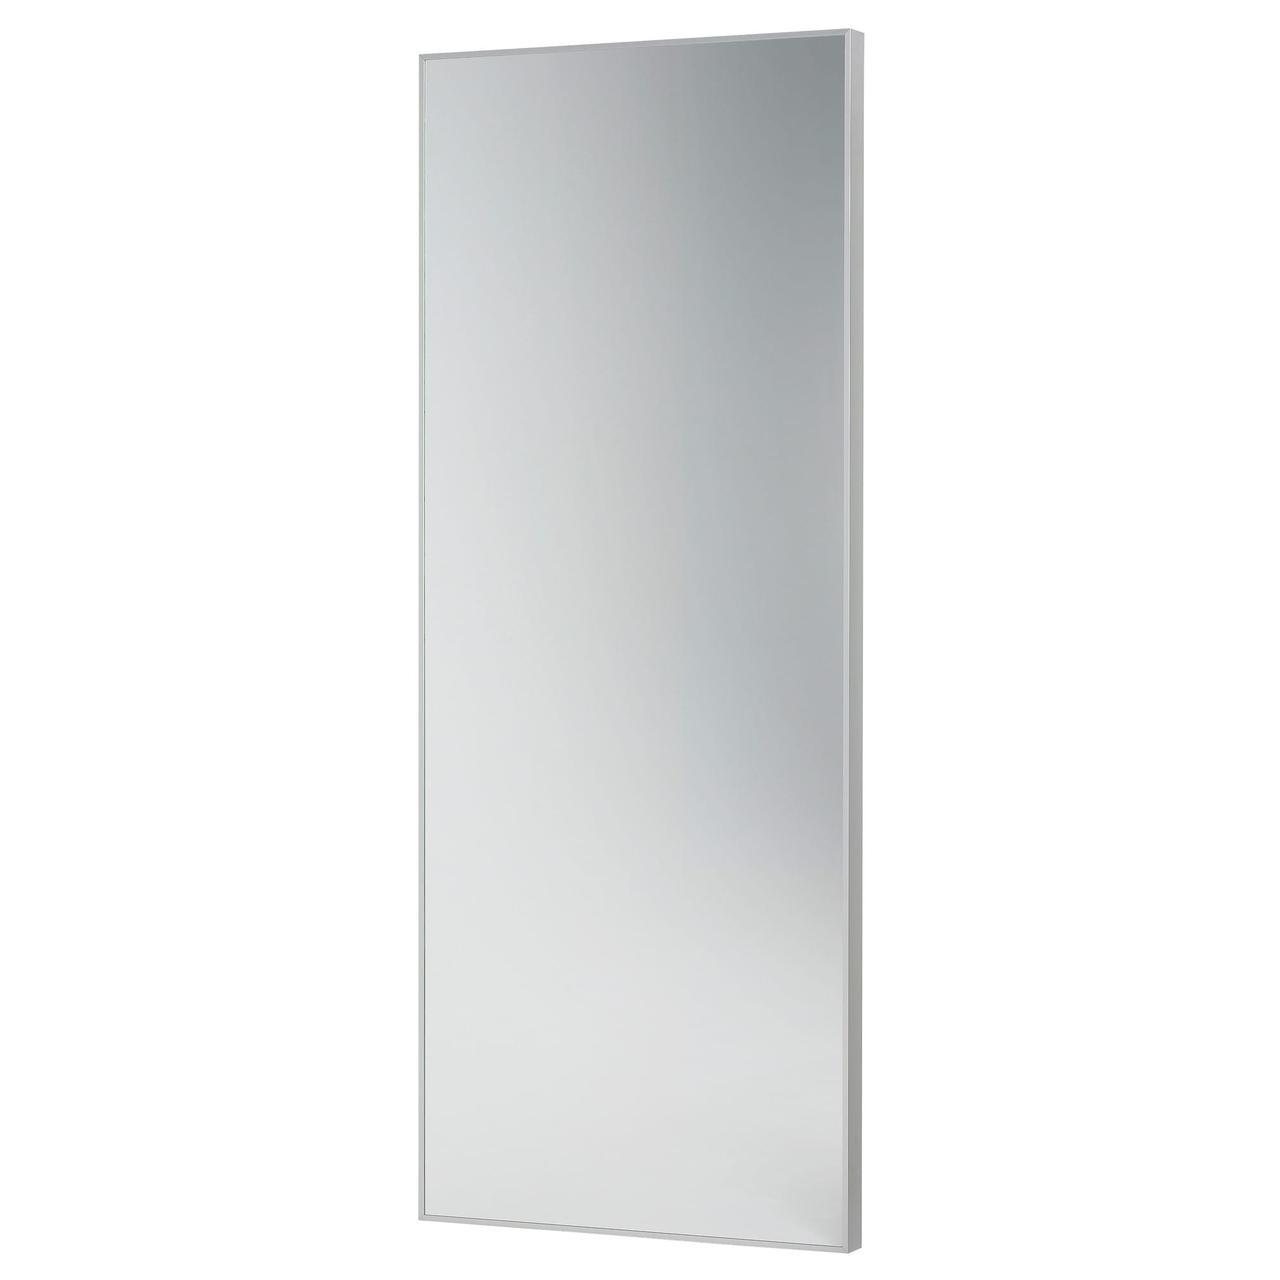 HOVET (500.382.13) Зеркало